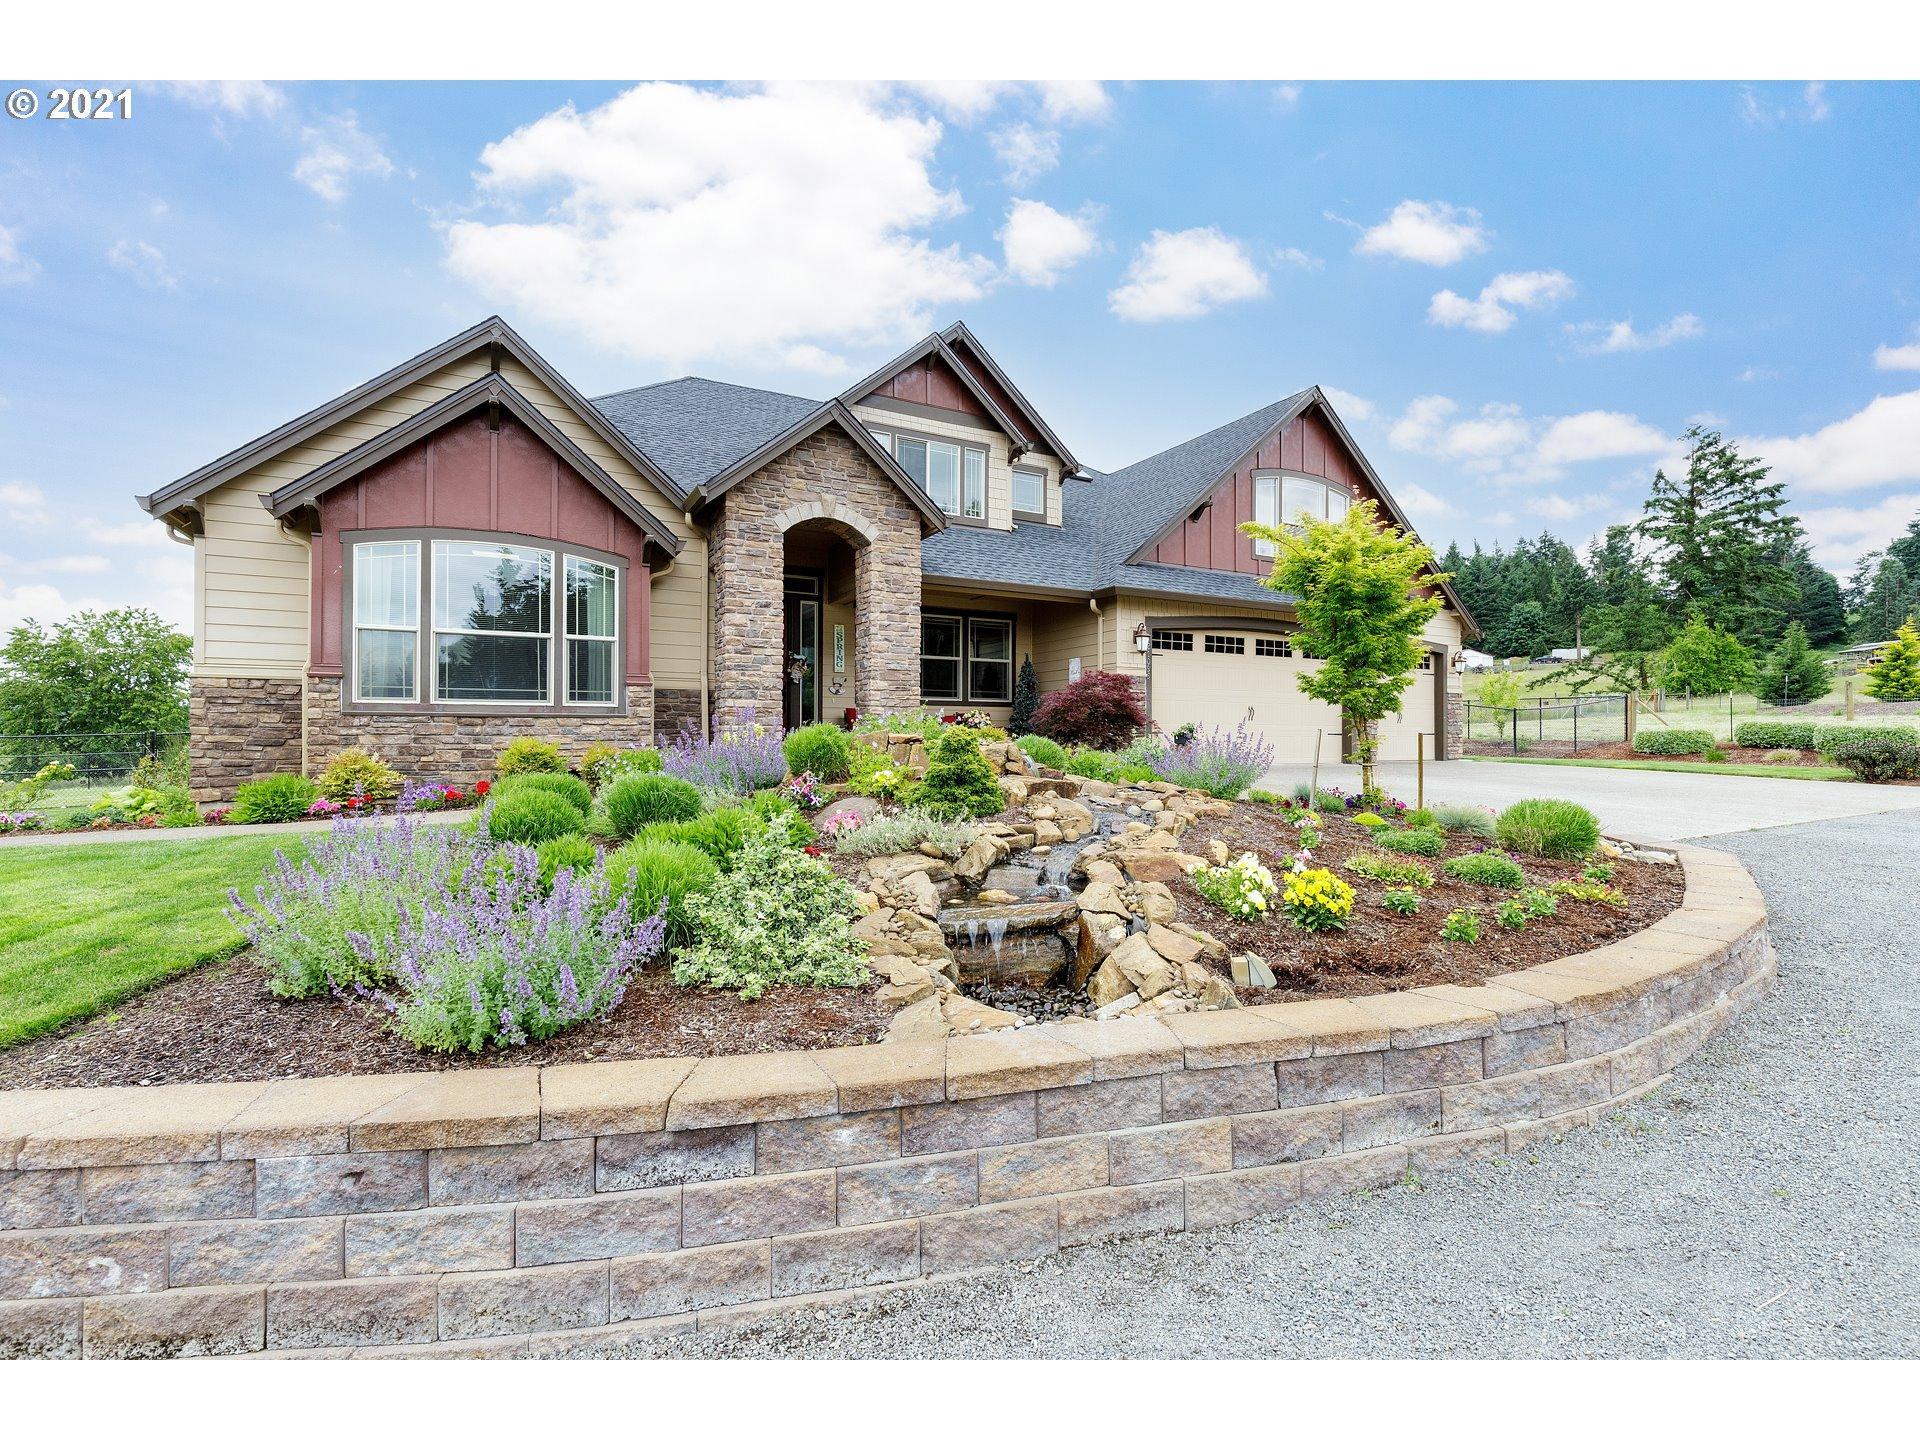 Property Image for 21098 S Leland Rd